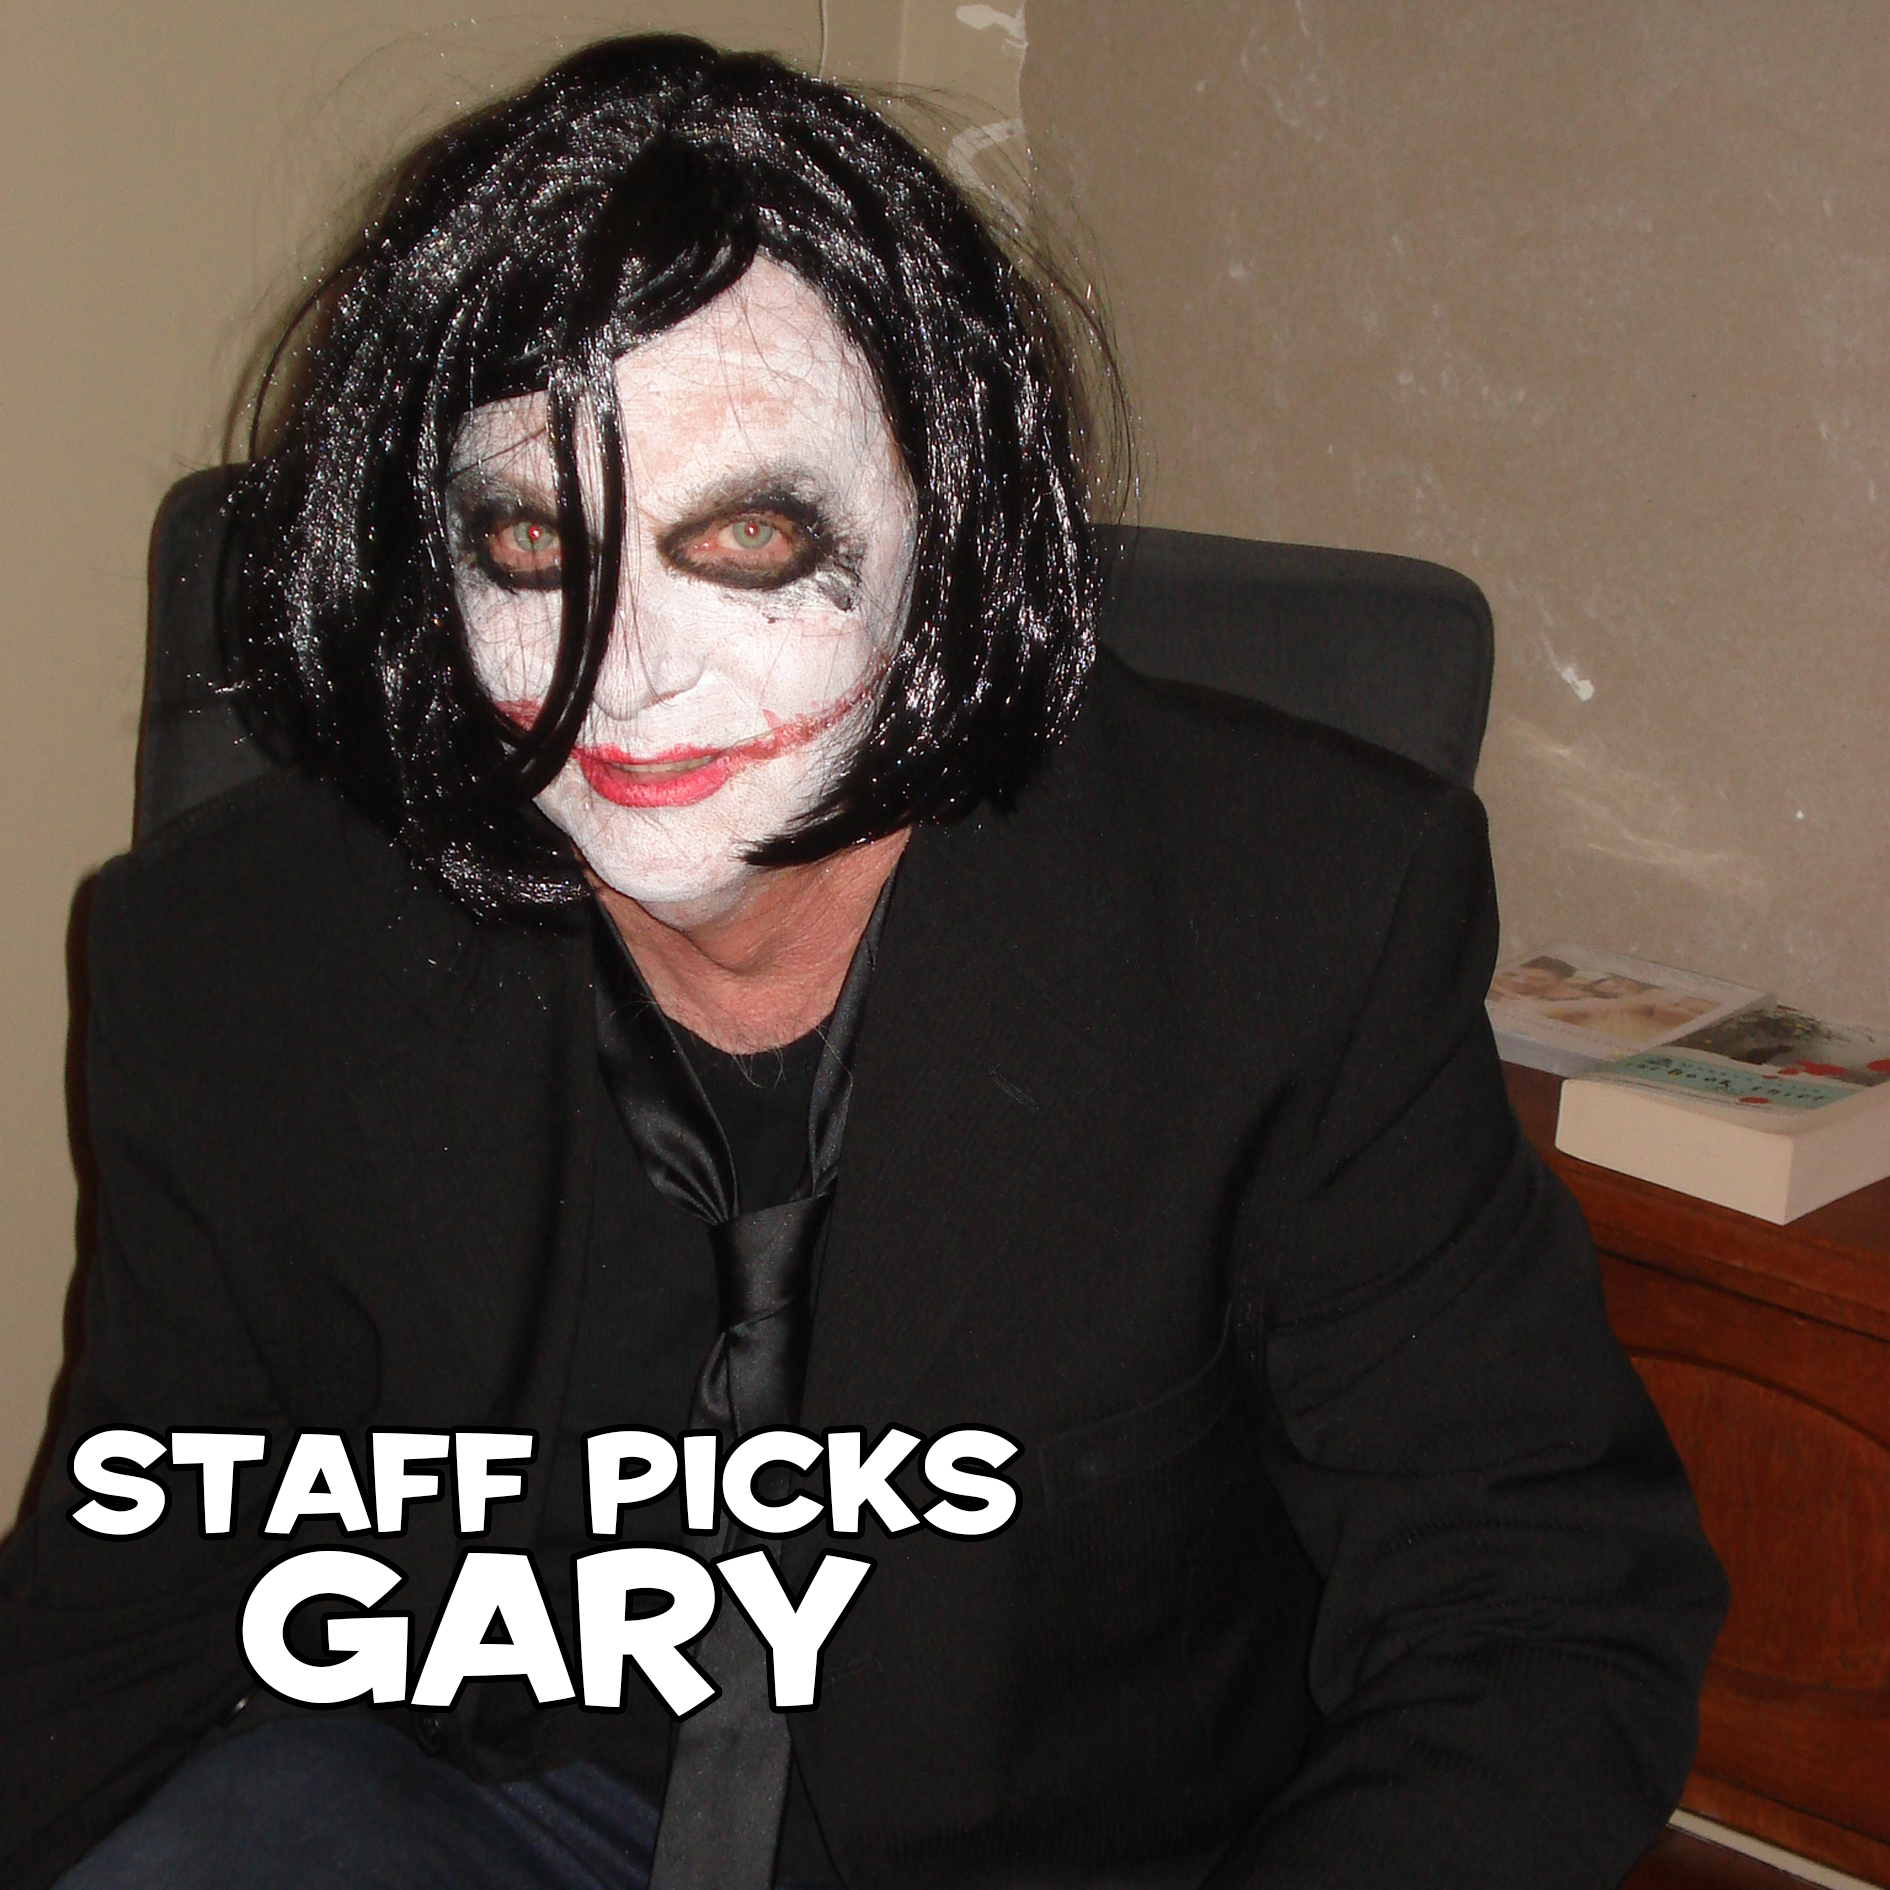 Gary Staff Picks